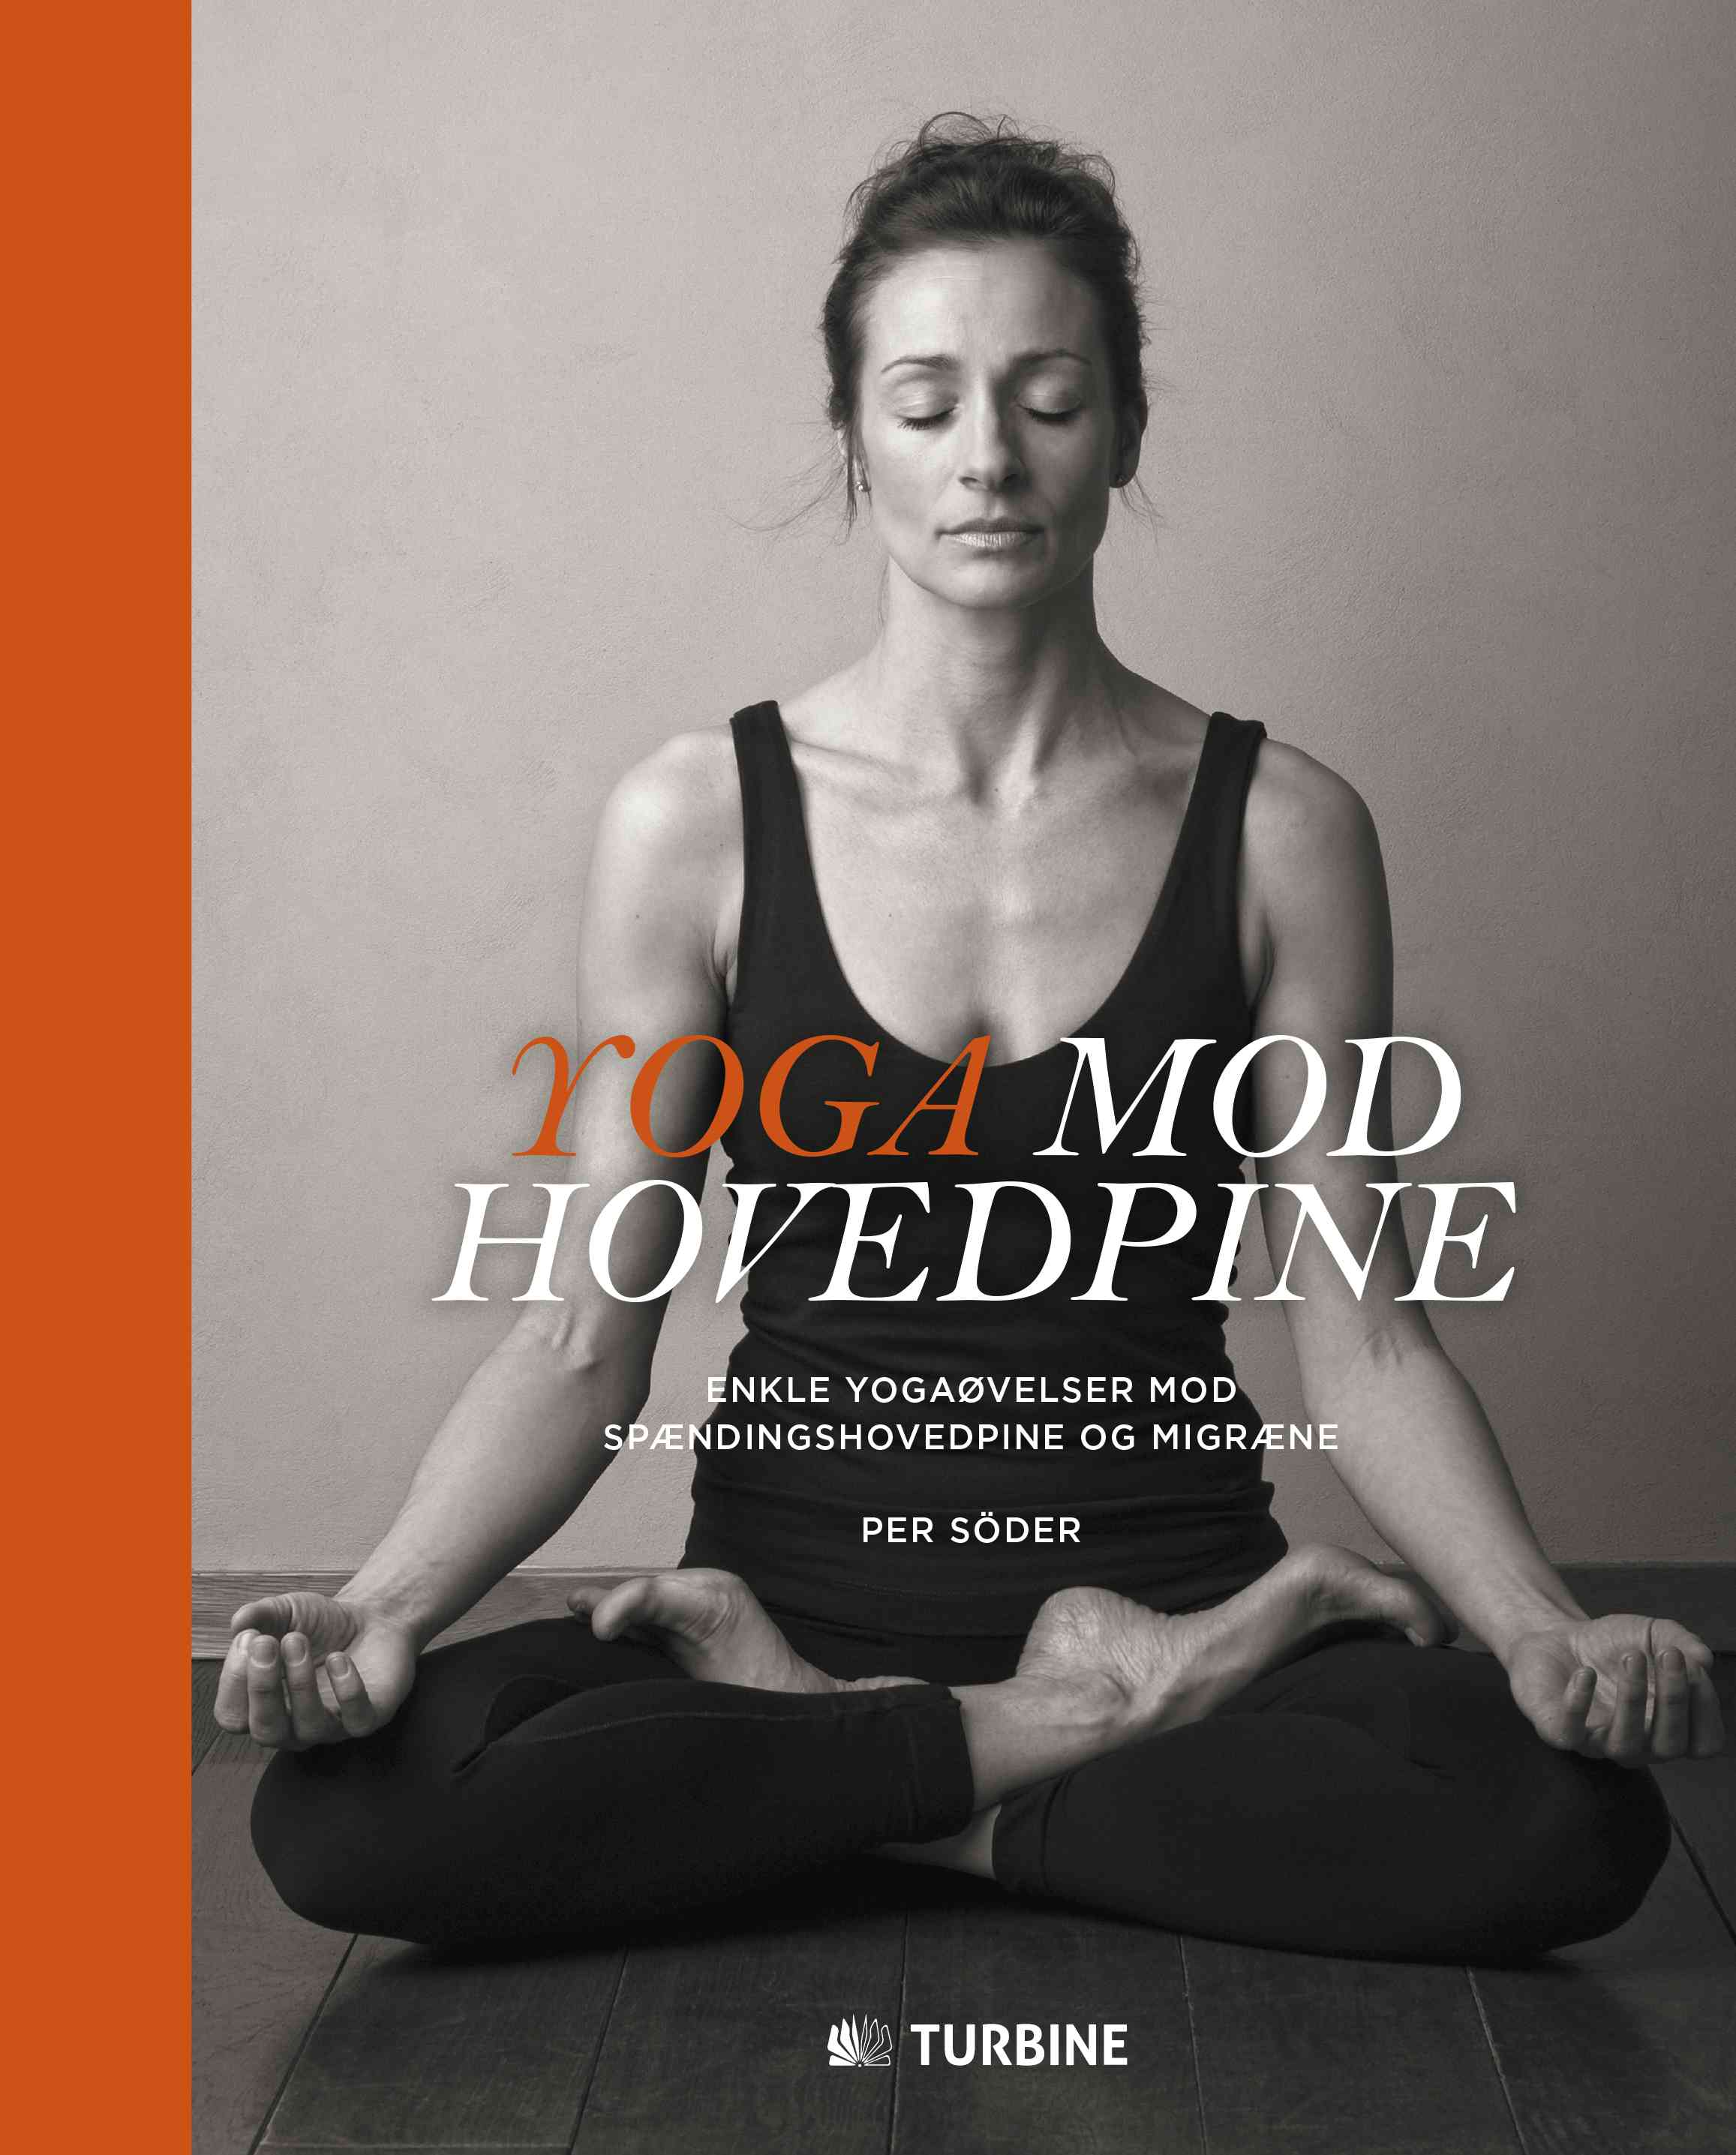 Yoga mod hovedpine